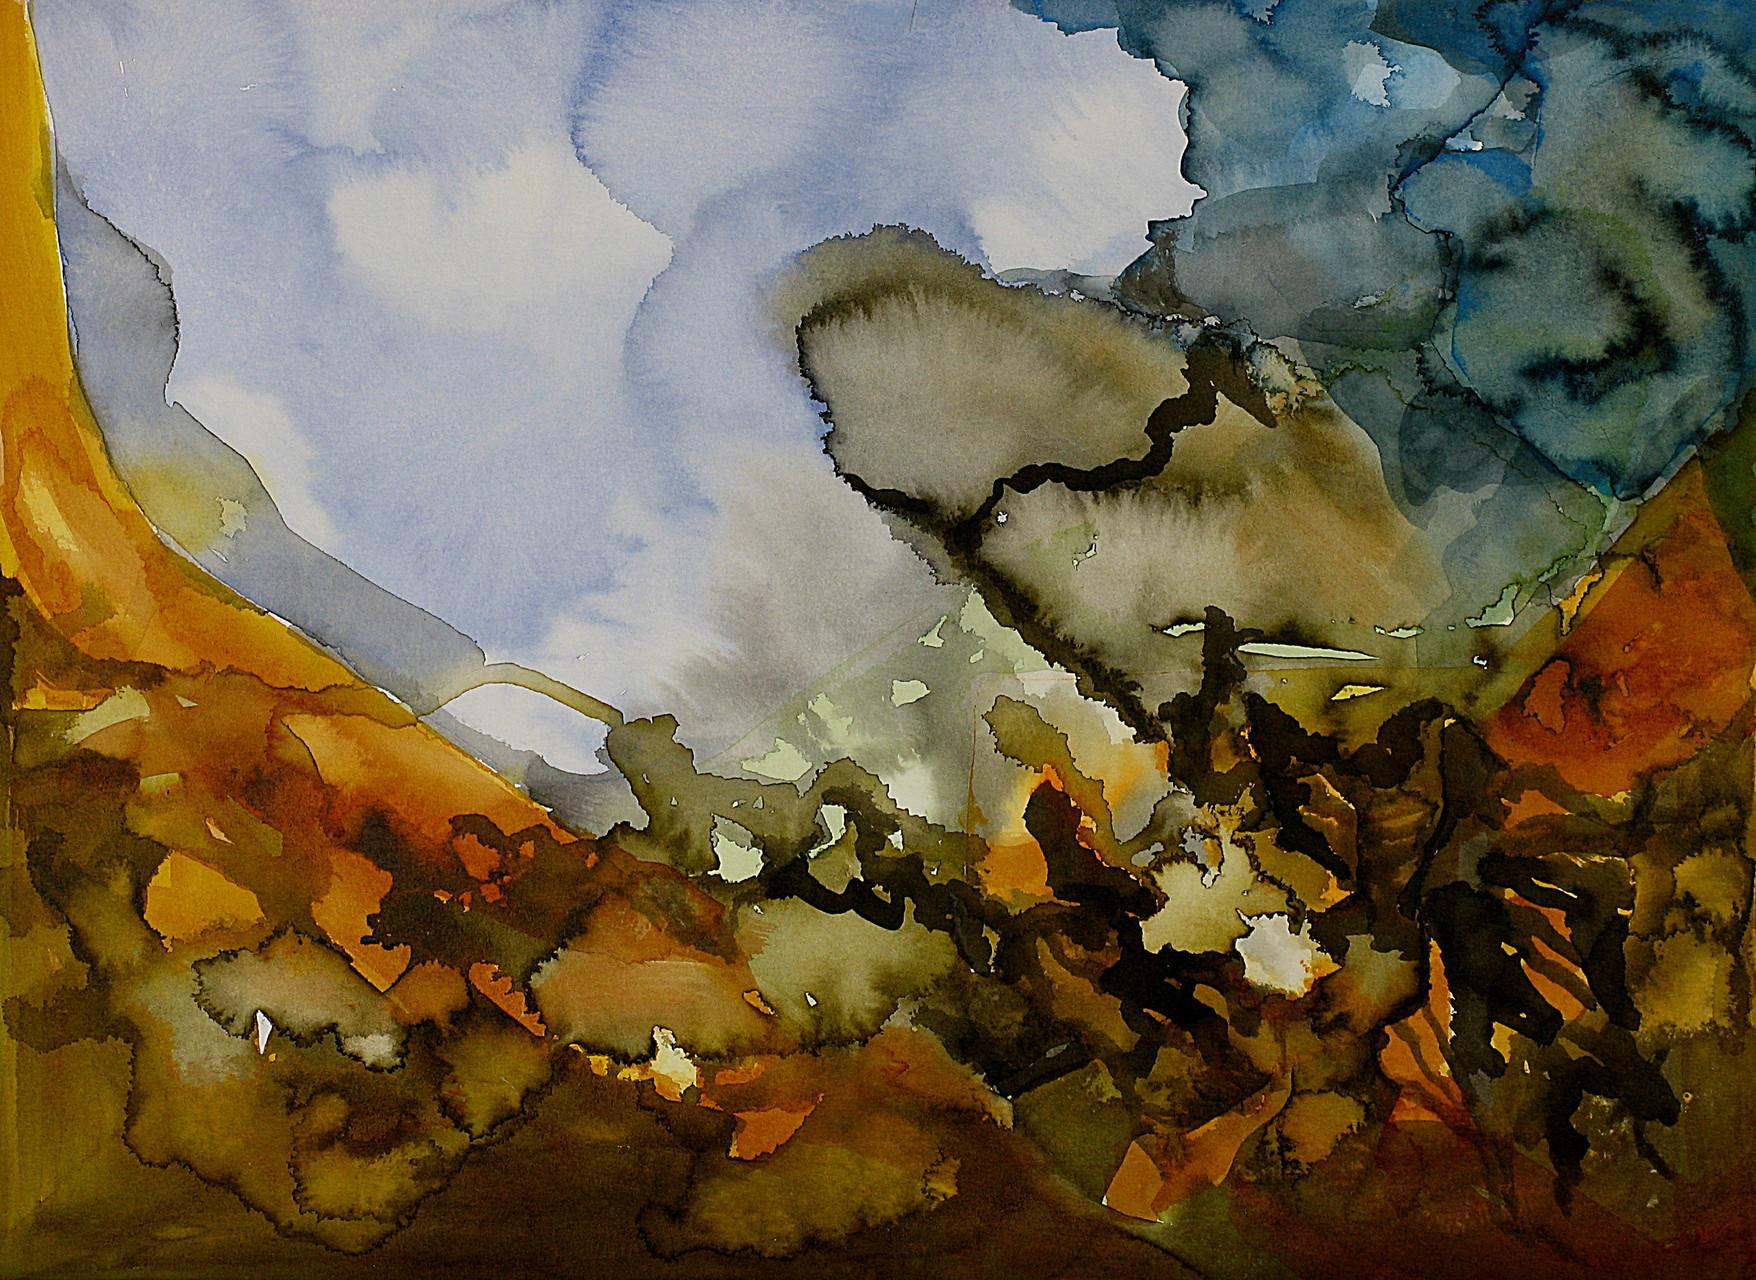 Randzone, Tusche auf Aquarellpapier, 36 x 48 cm